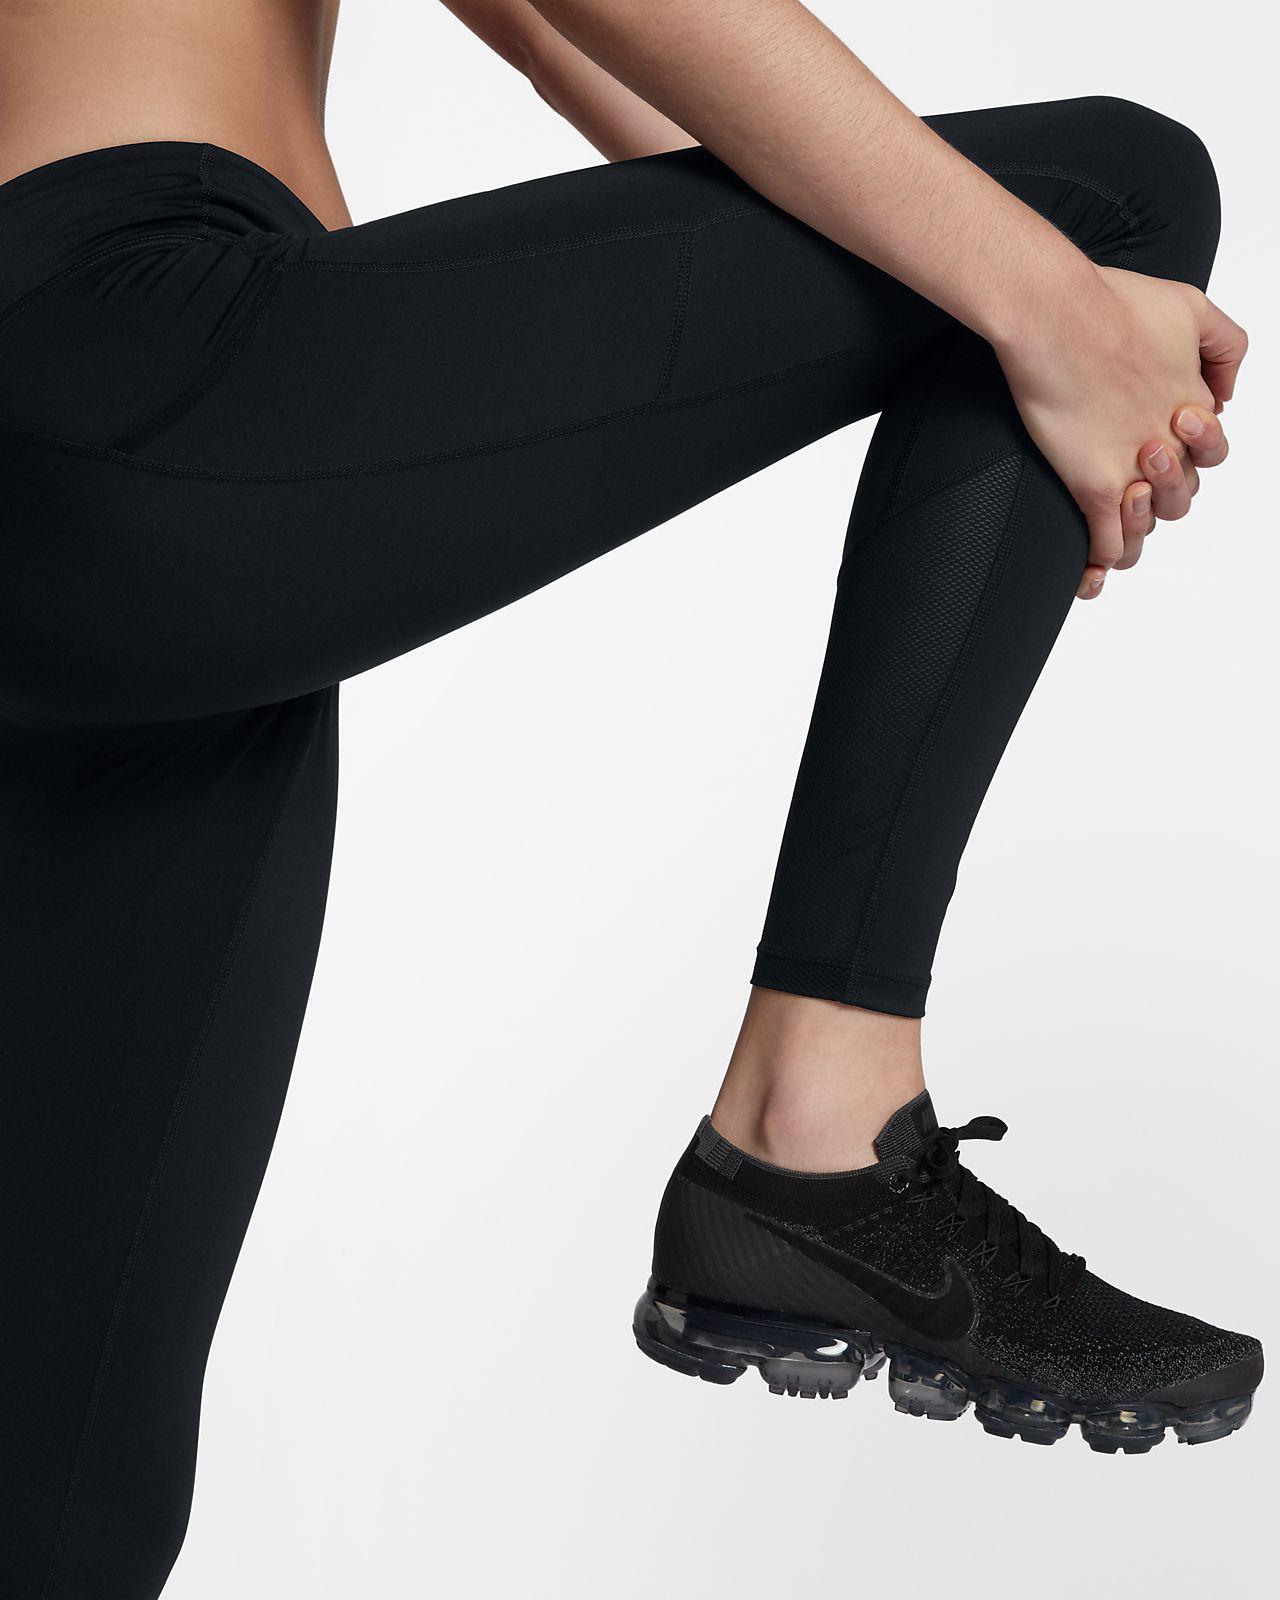 Nike Racer Women's Running Tights